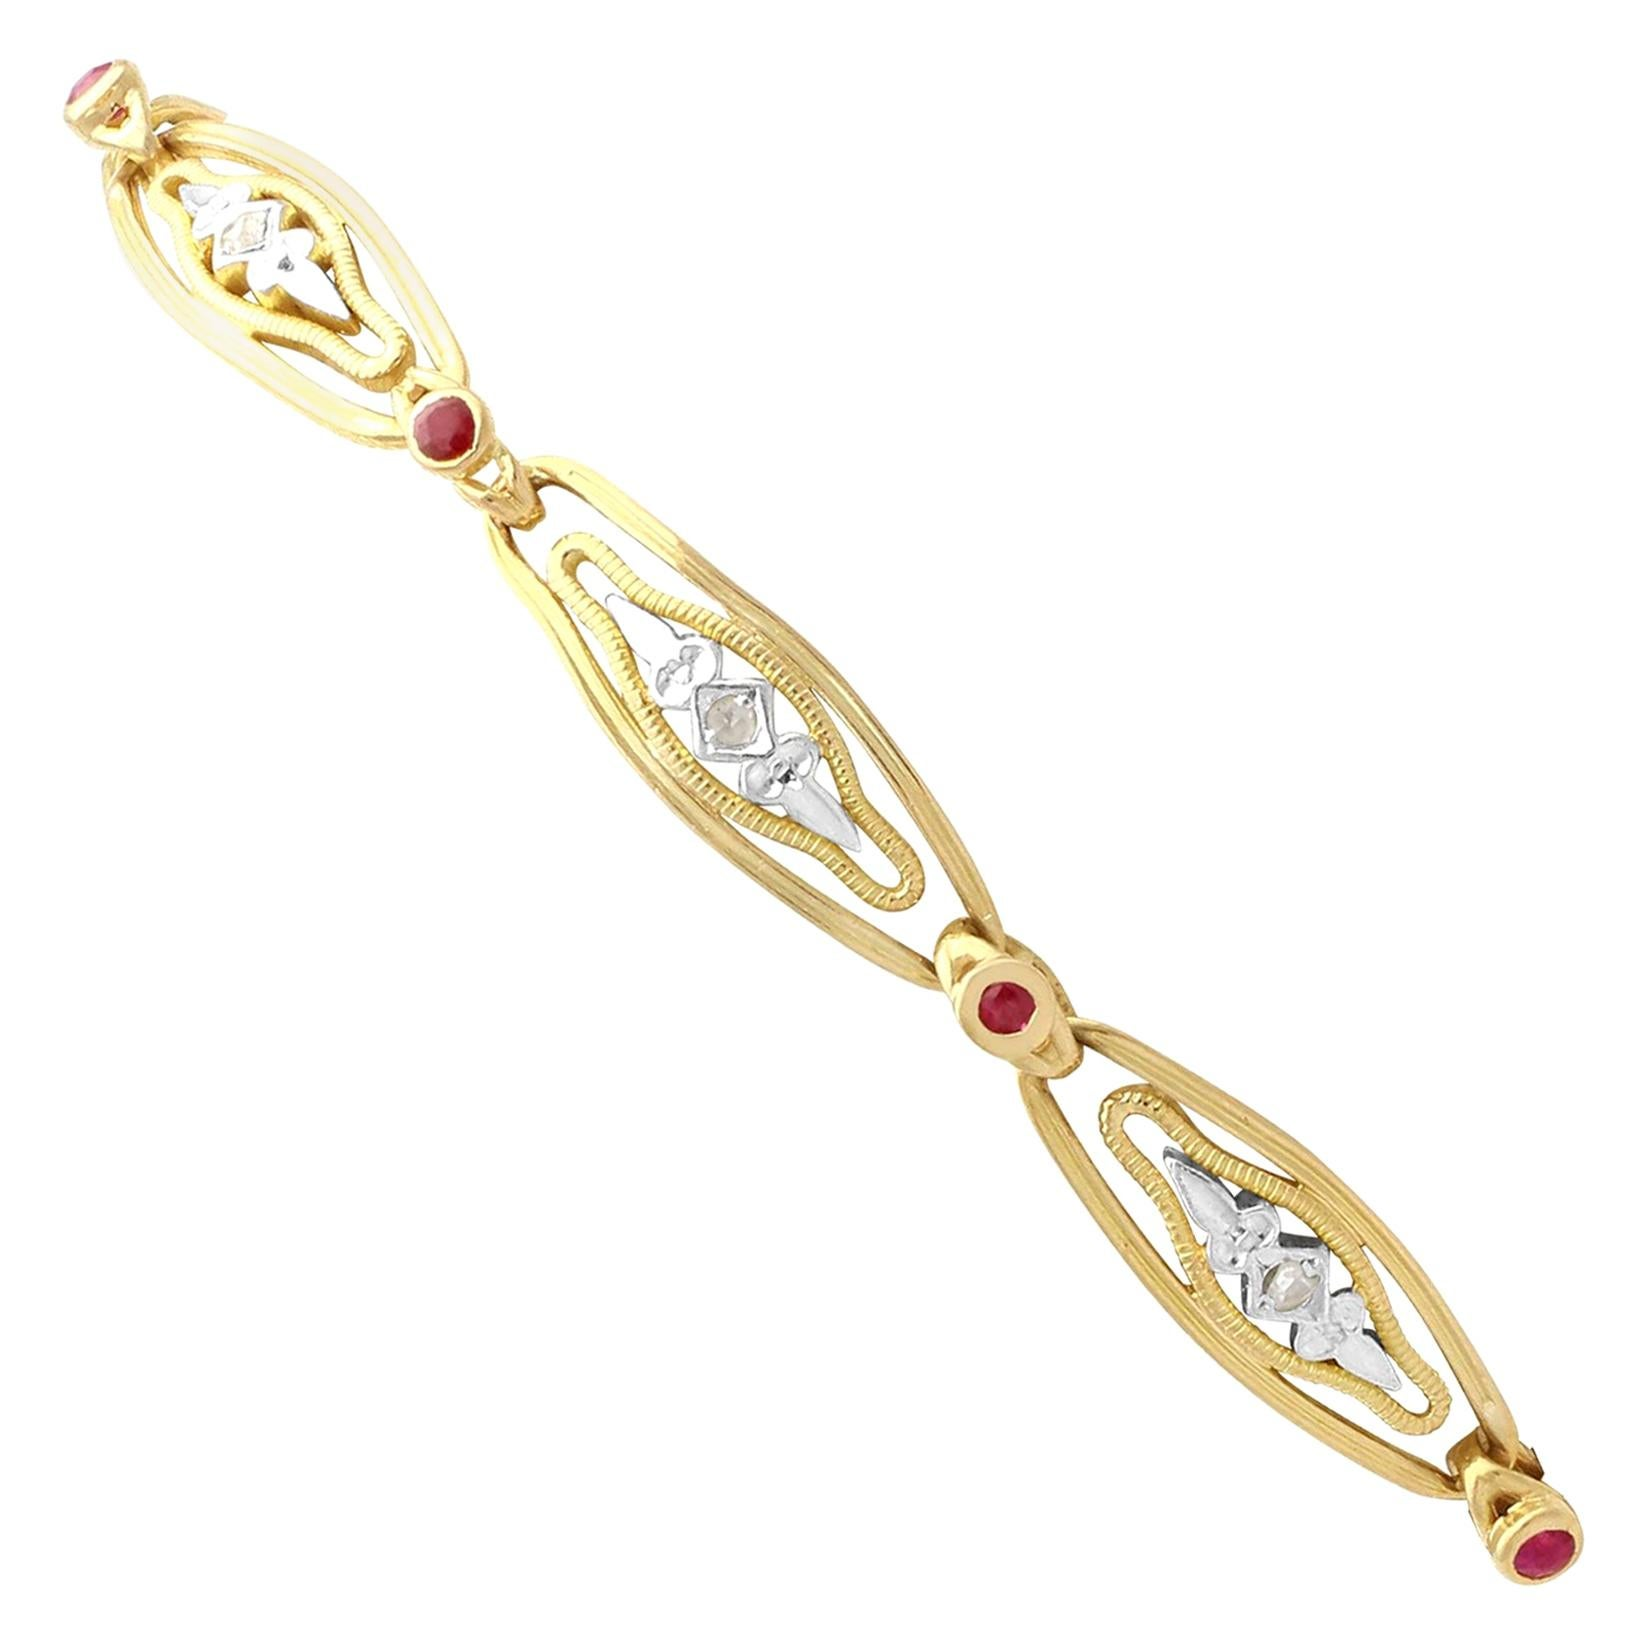 1950s Vintage French Ruby and Diamond Gold Bracelet